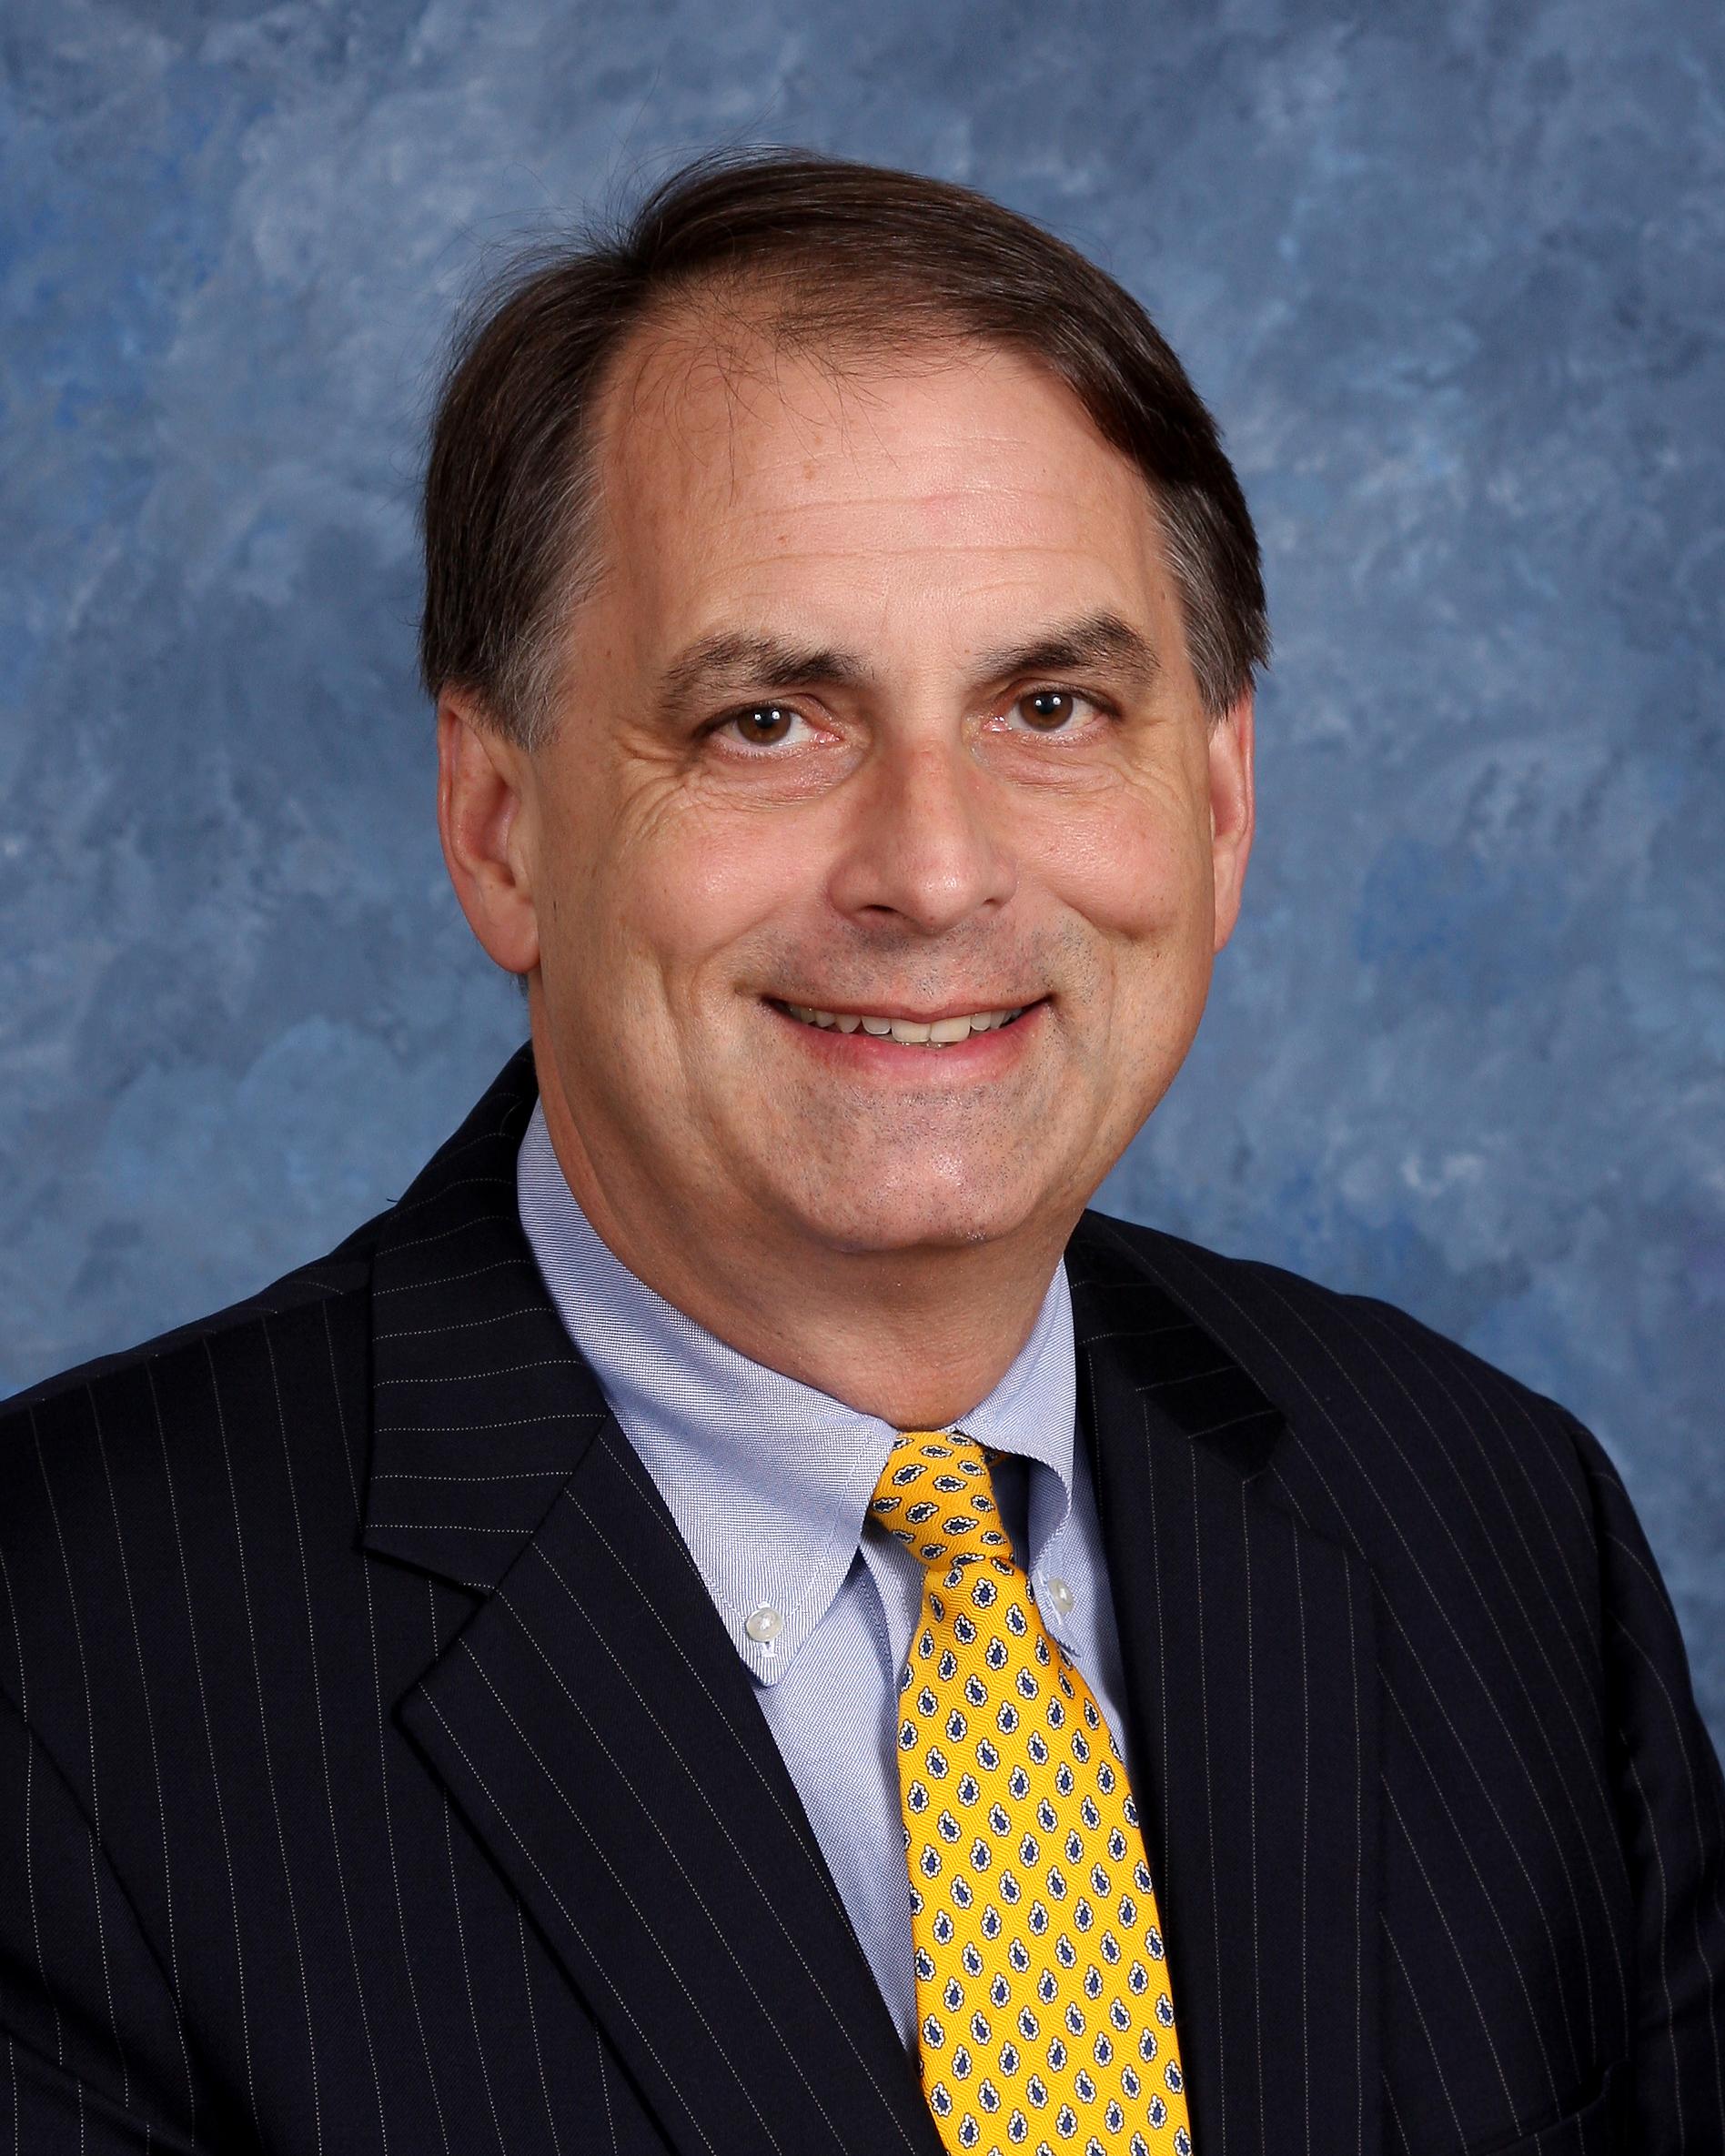 Thomas W. King III